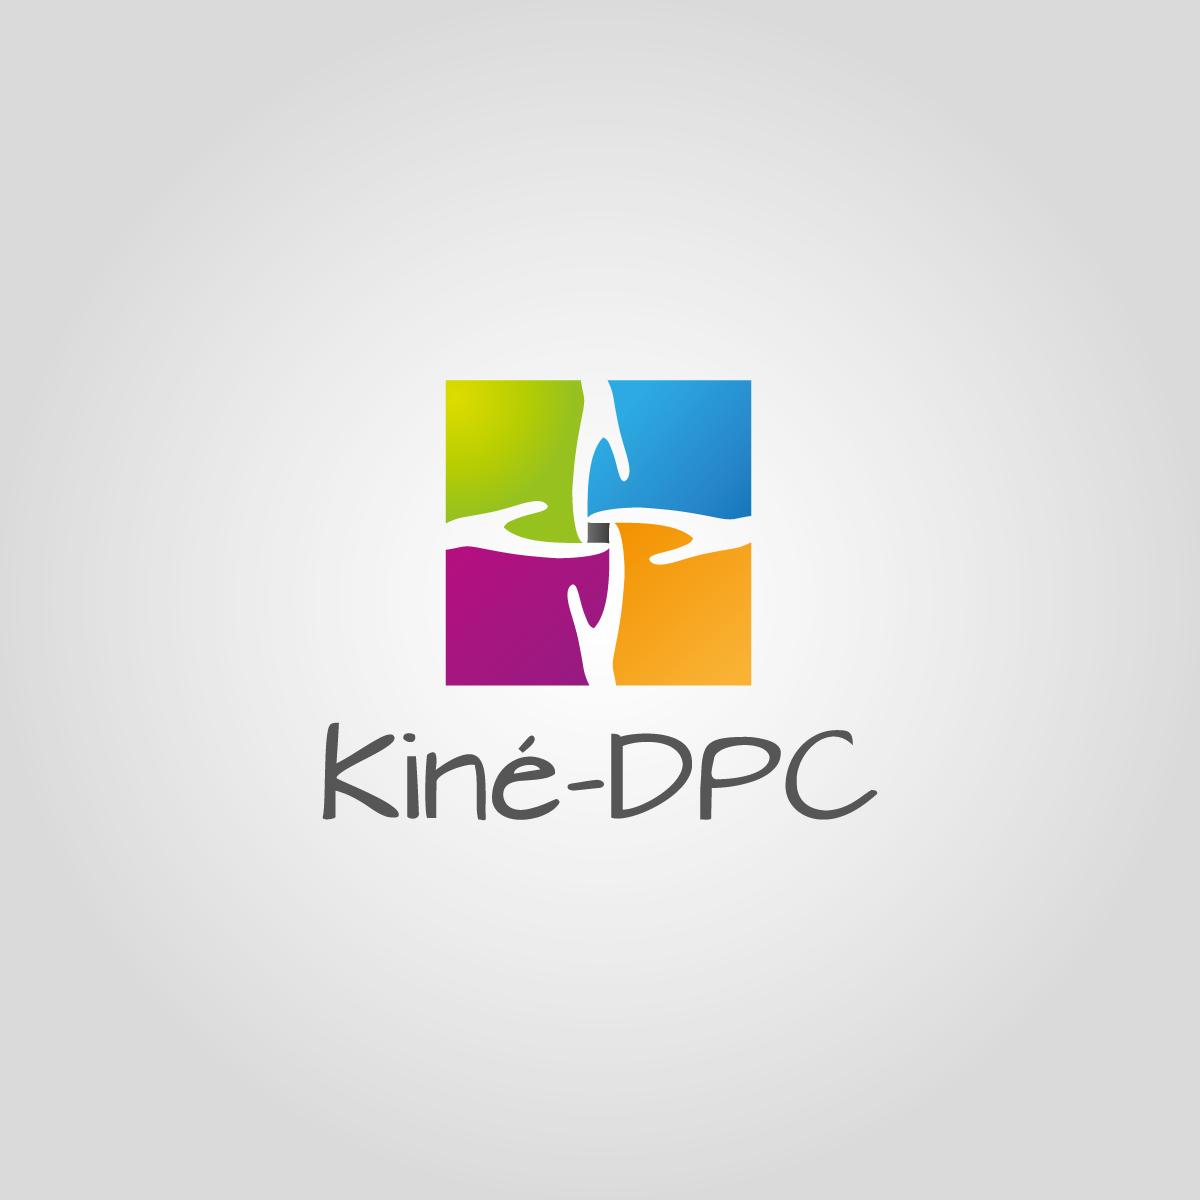 kine-dpc-logo